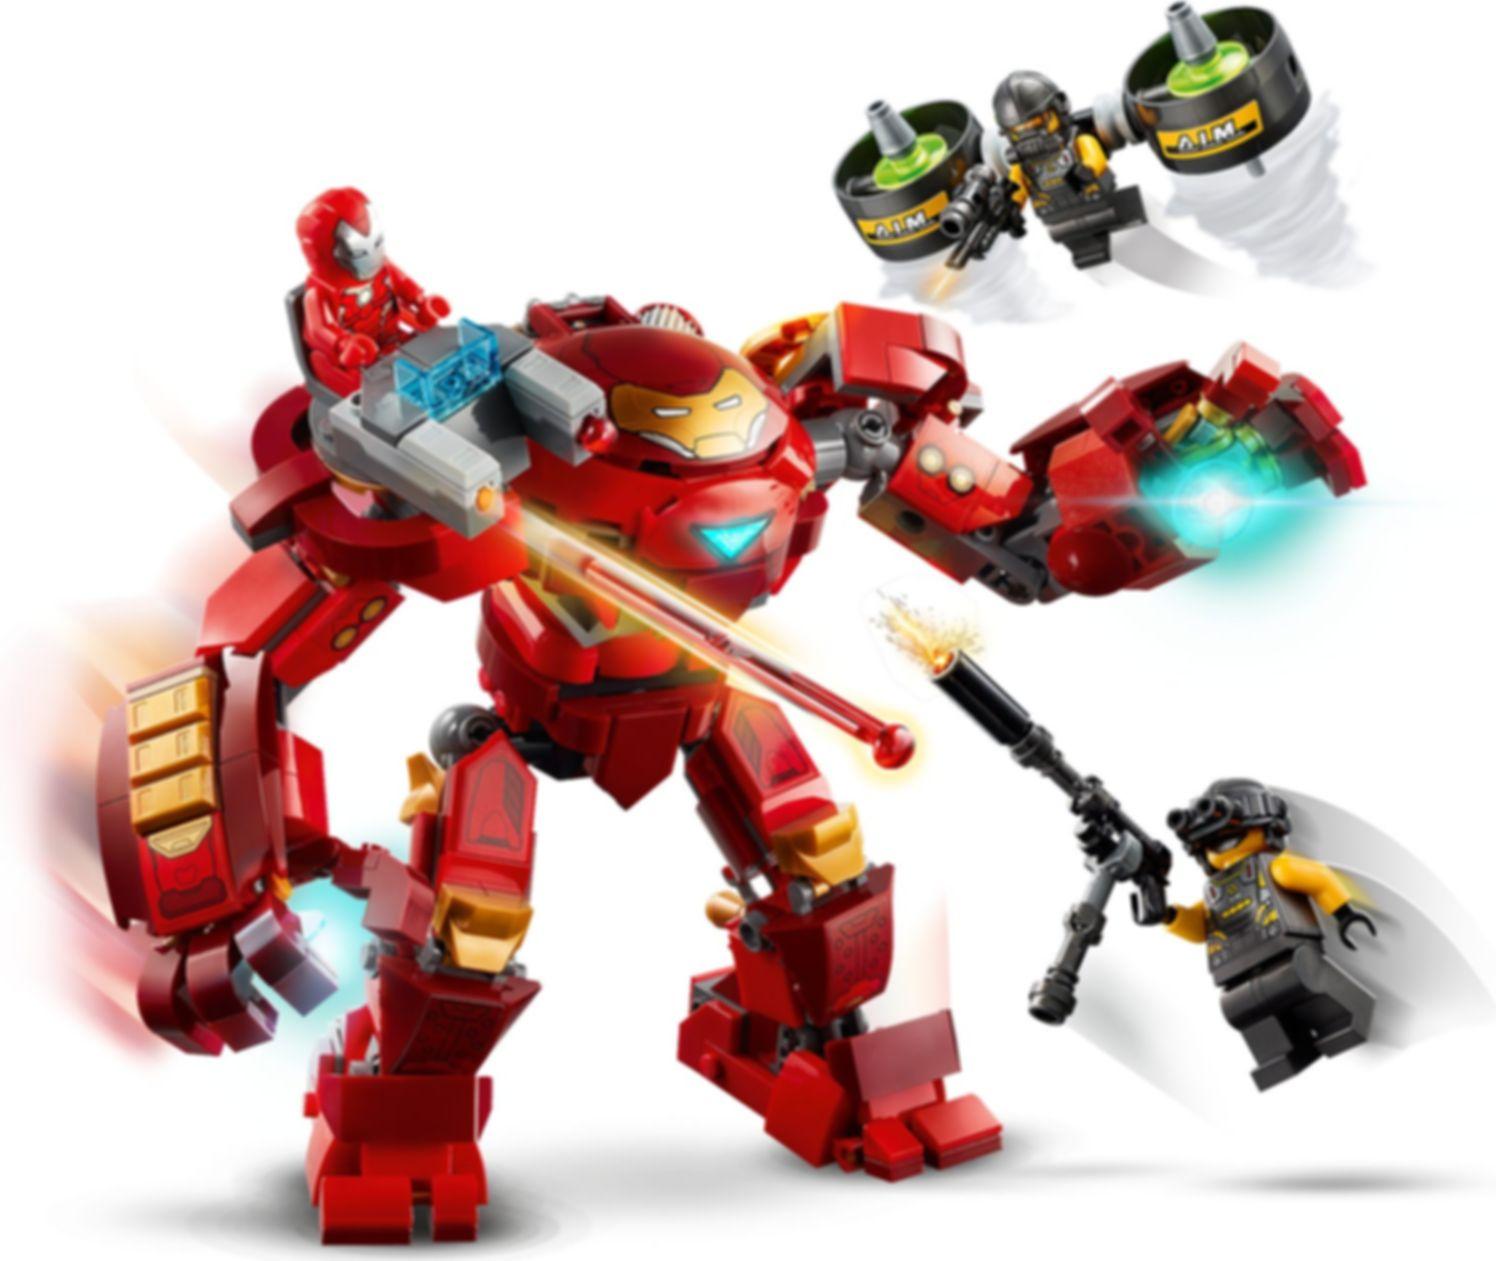 Iron Man Hulkbuster versus A.I.M. Agent gameplay